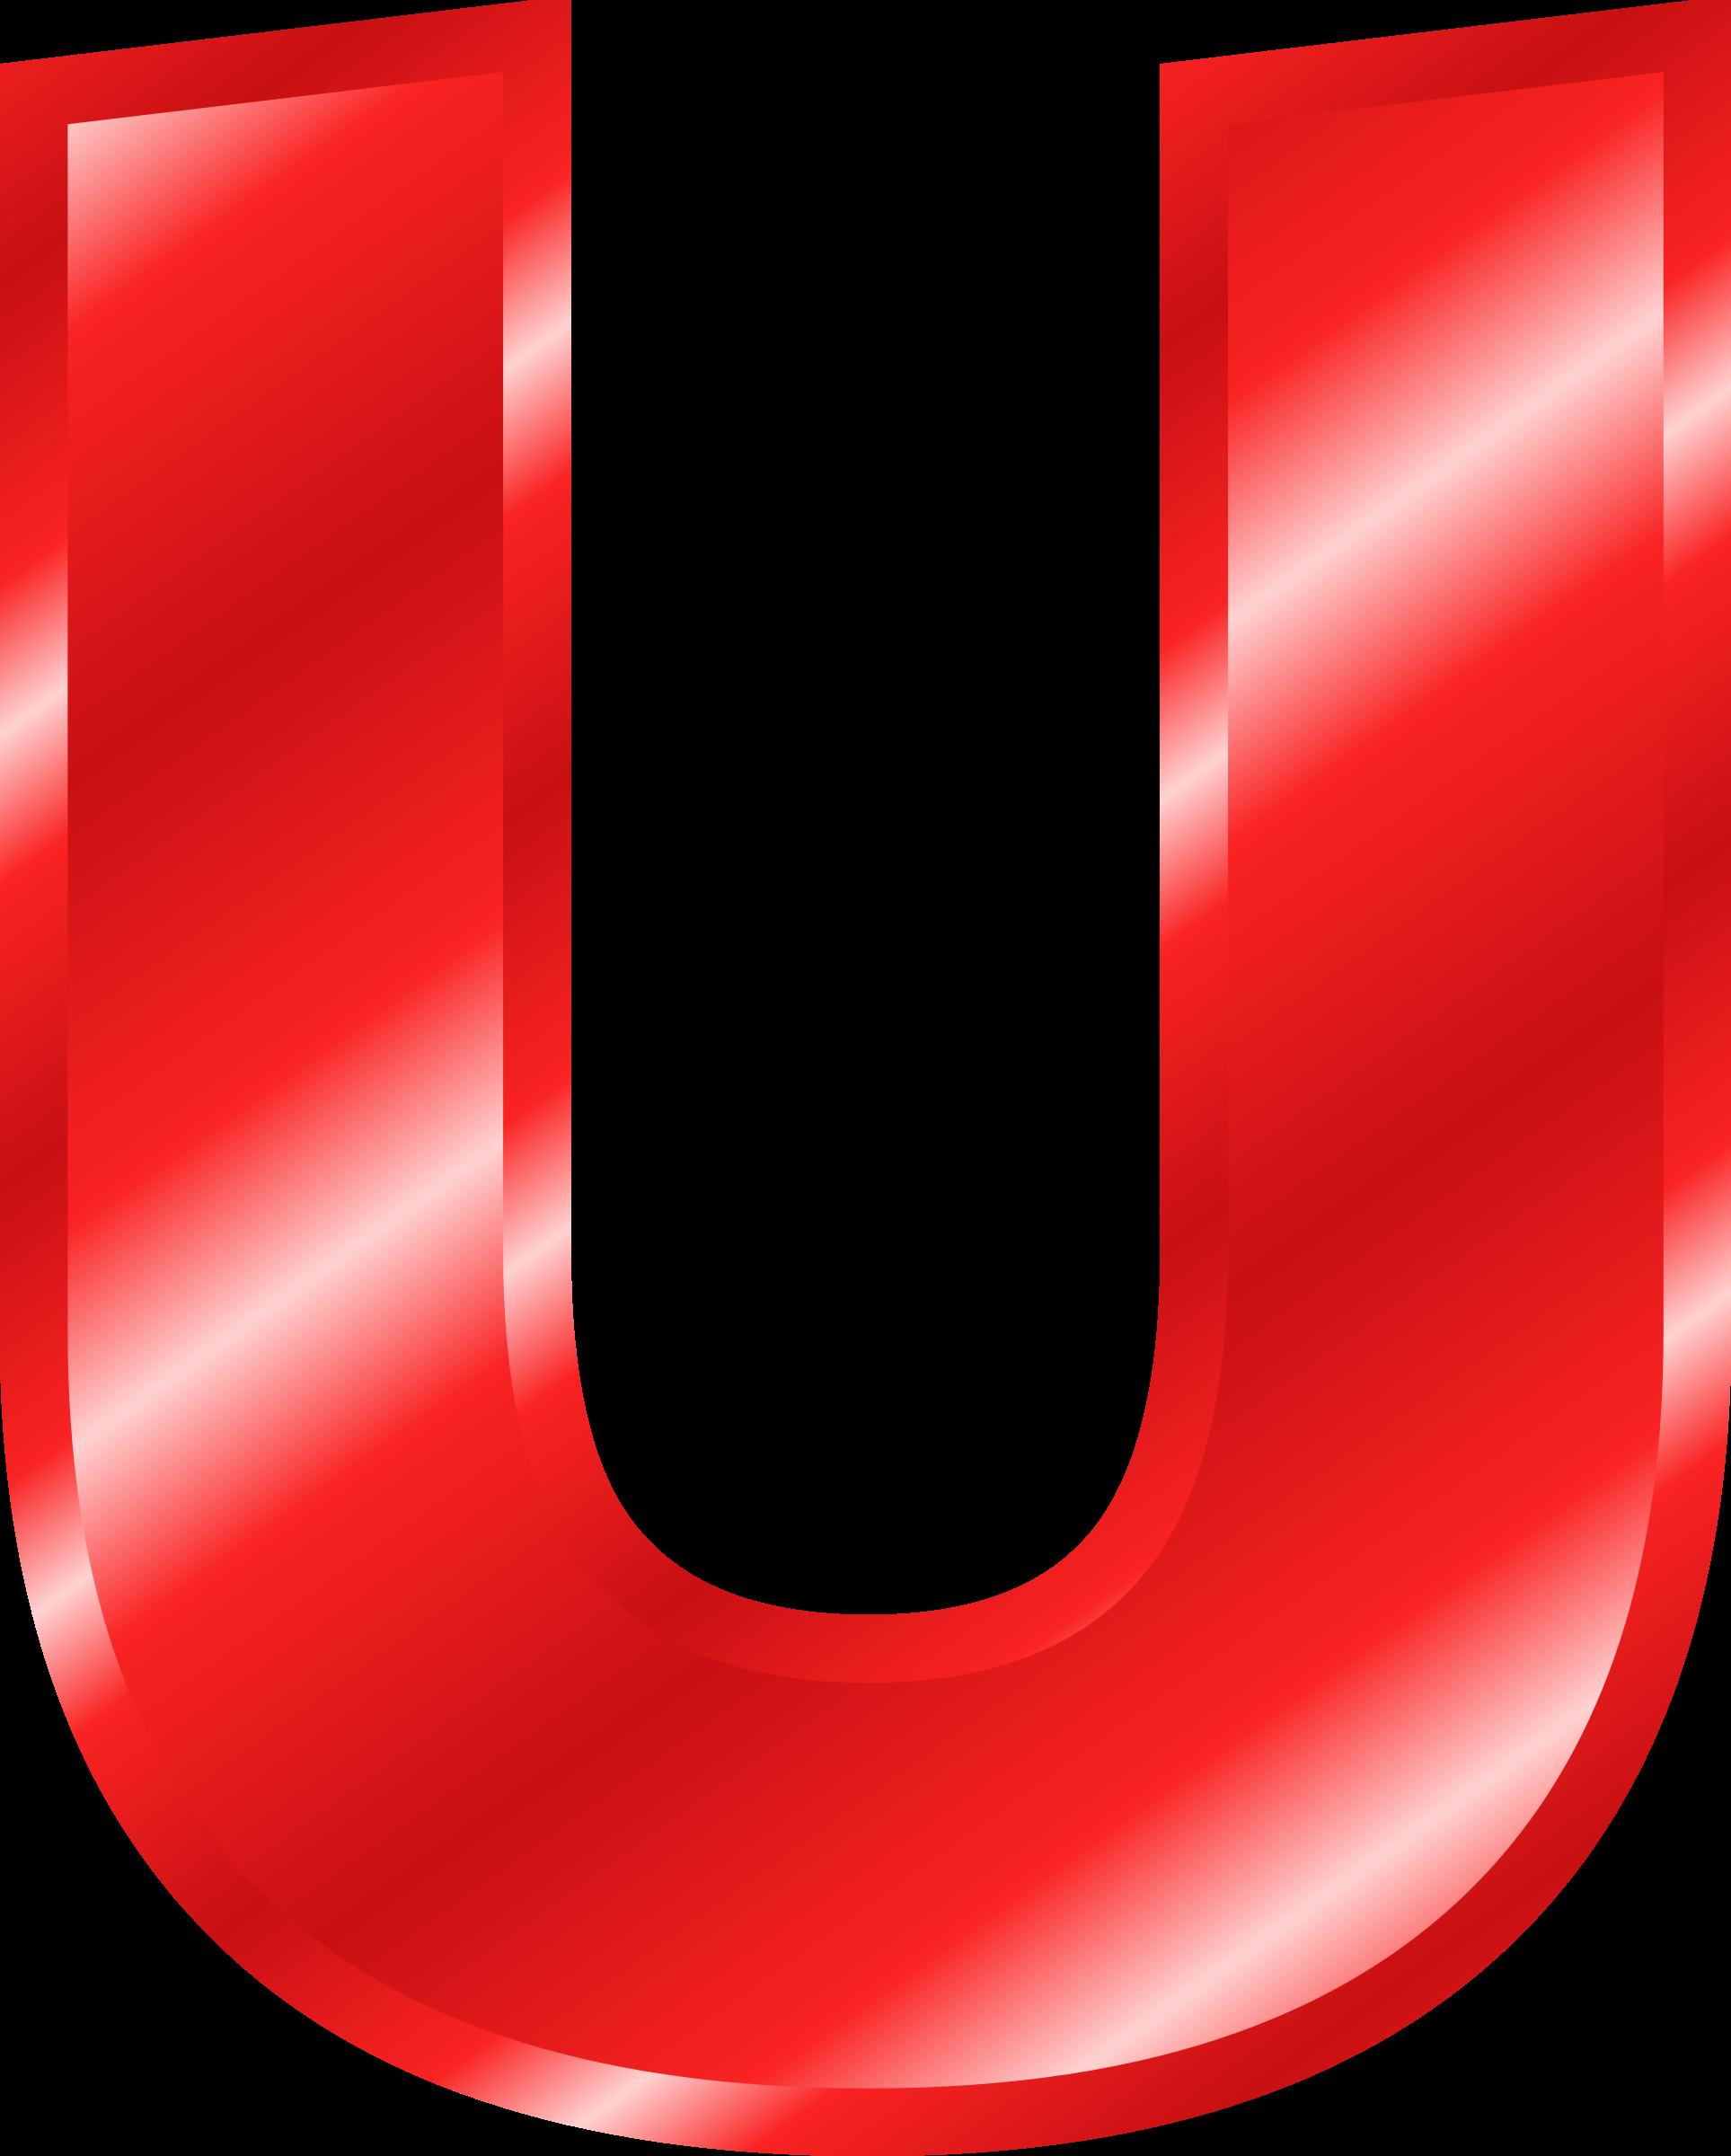 E clipart red letter. Effect letters alphabet big